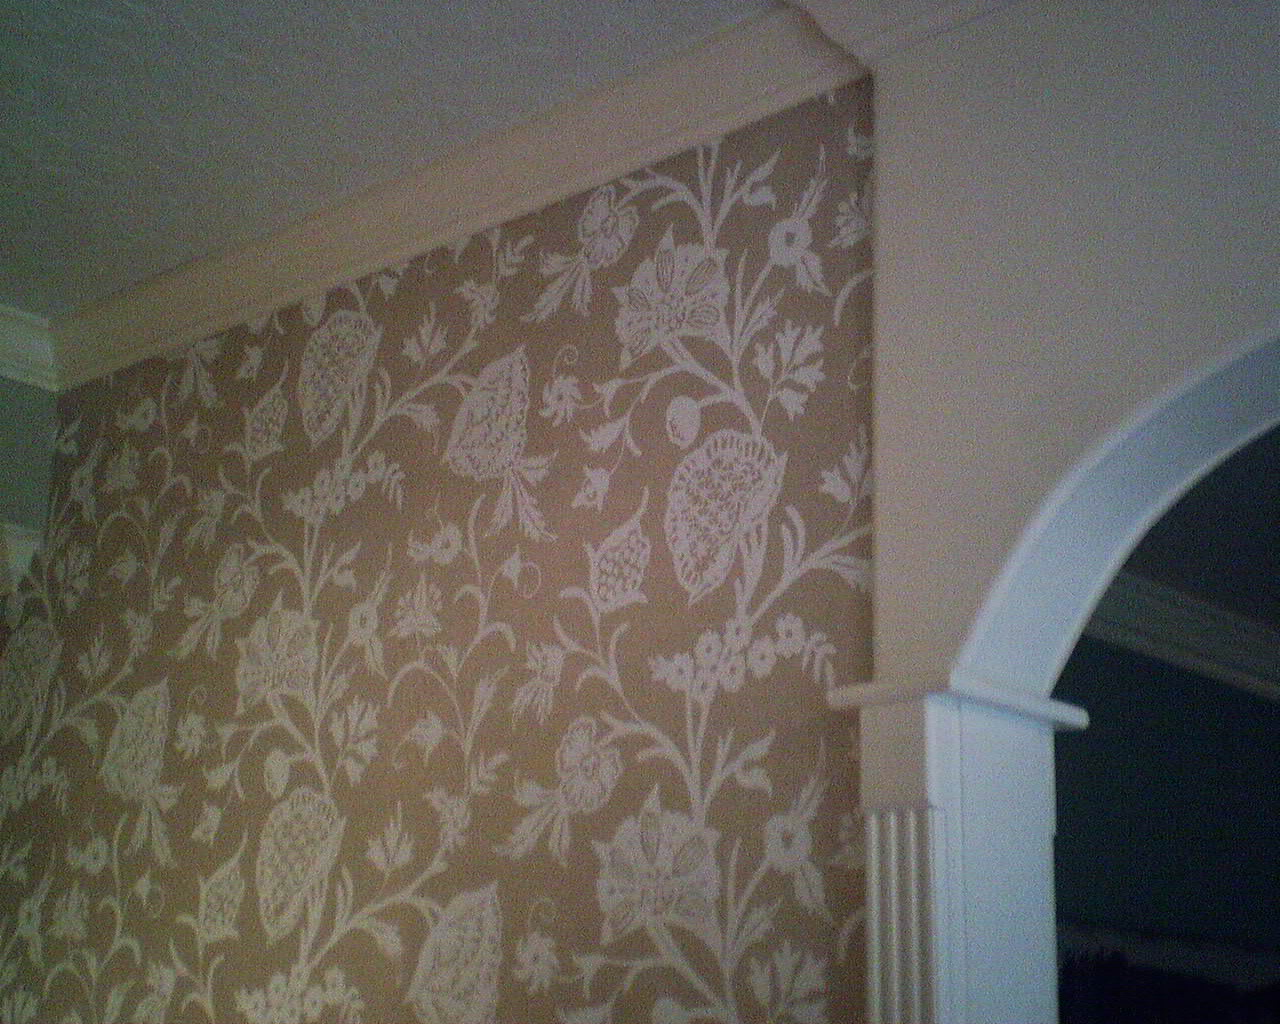 Amazing Wallpaper Home Screen Marble - dsc00072  2018_98831.jpg